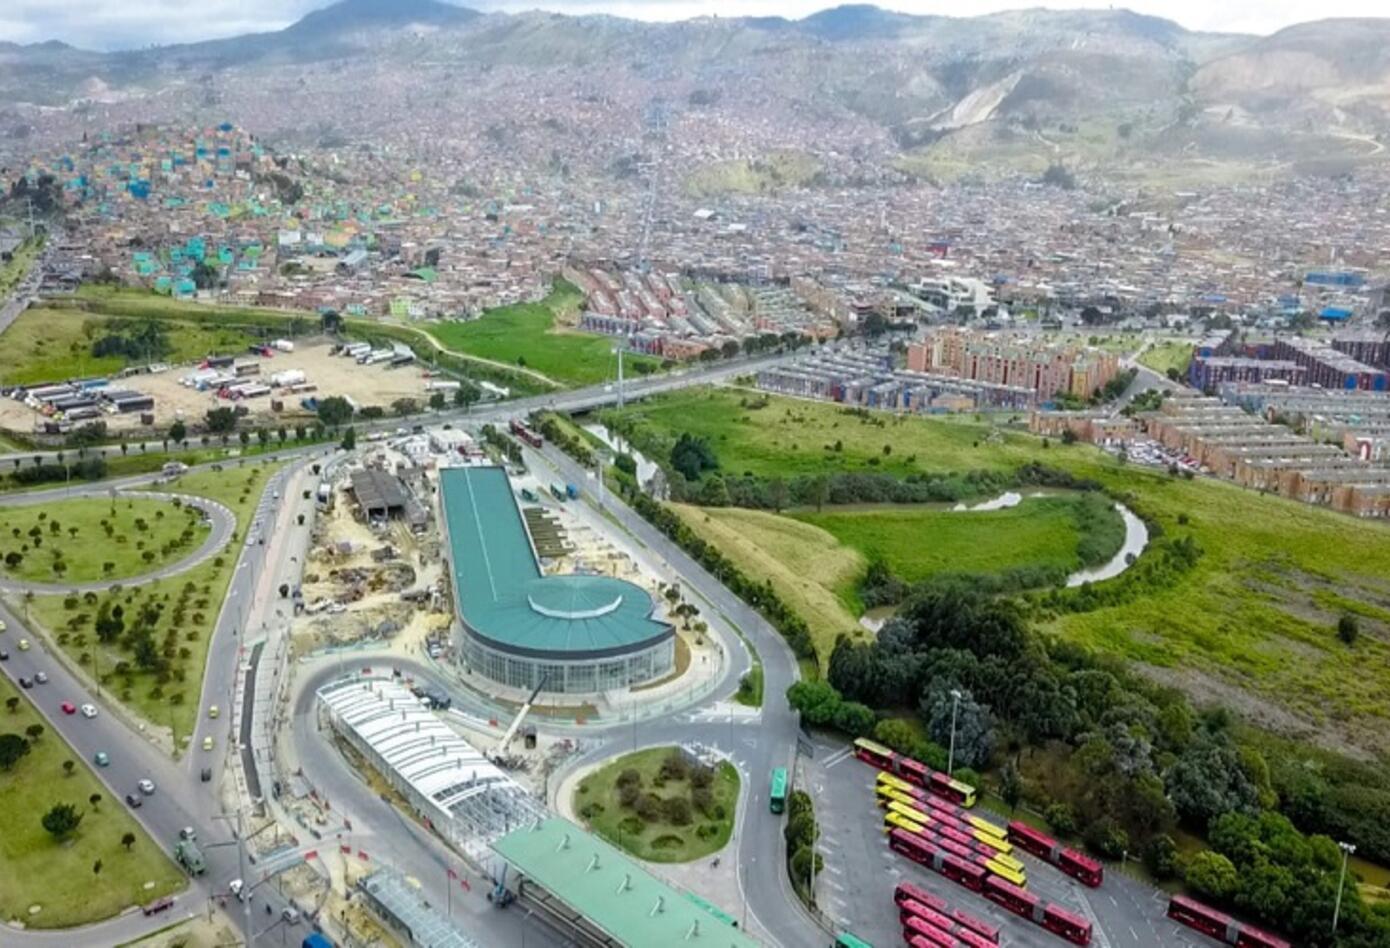 Transmicable de Ciudad Bolivar